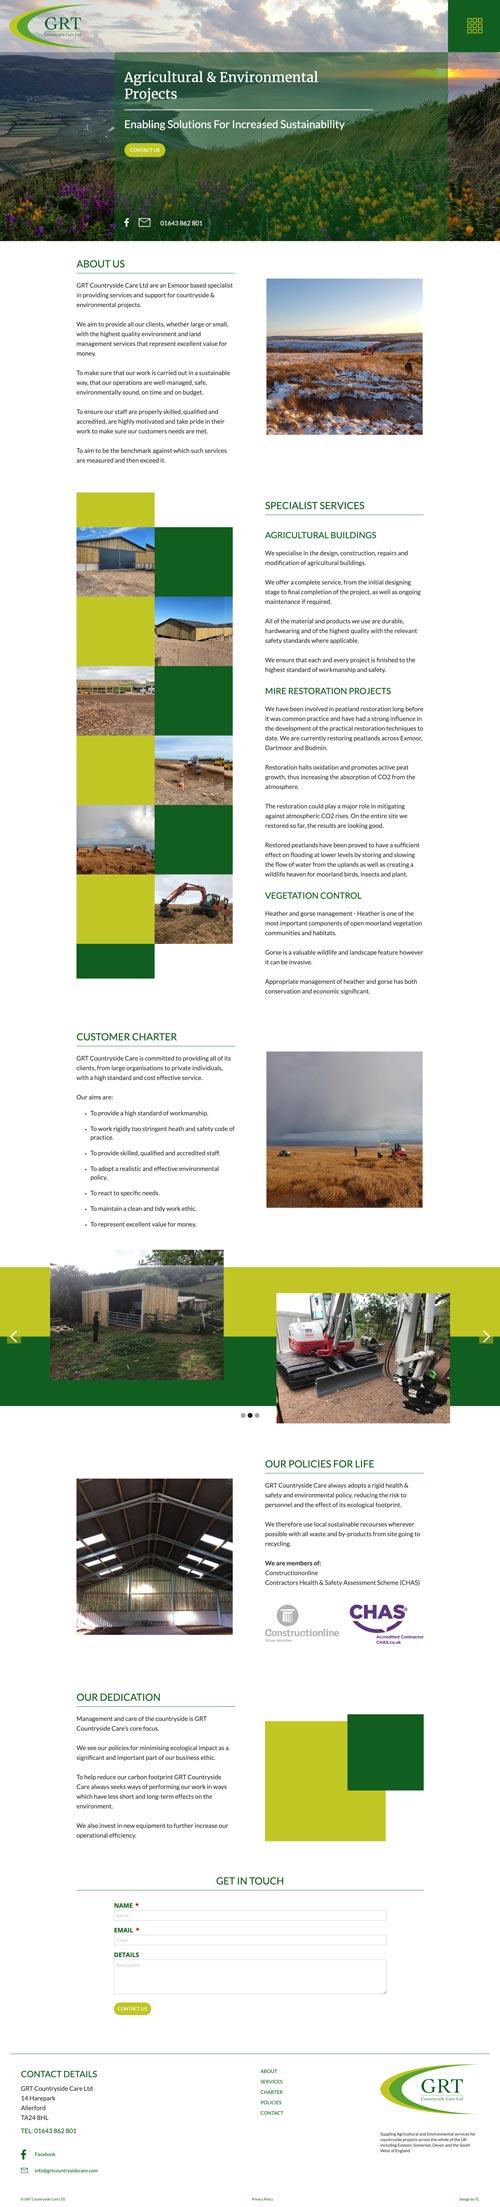 GRT countryside Care UK webs design